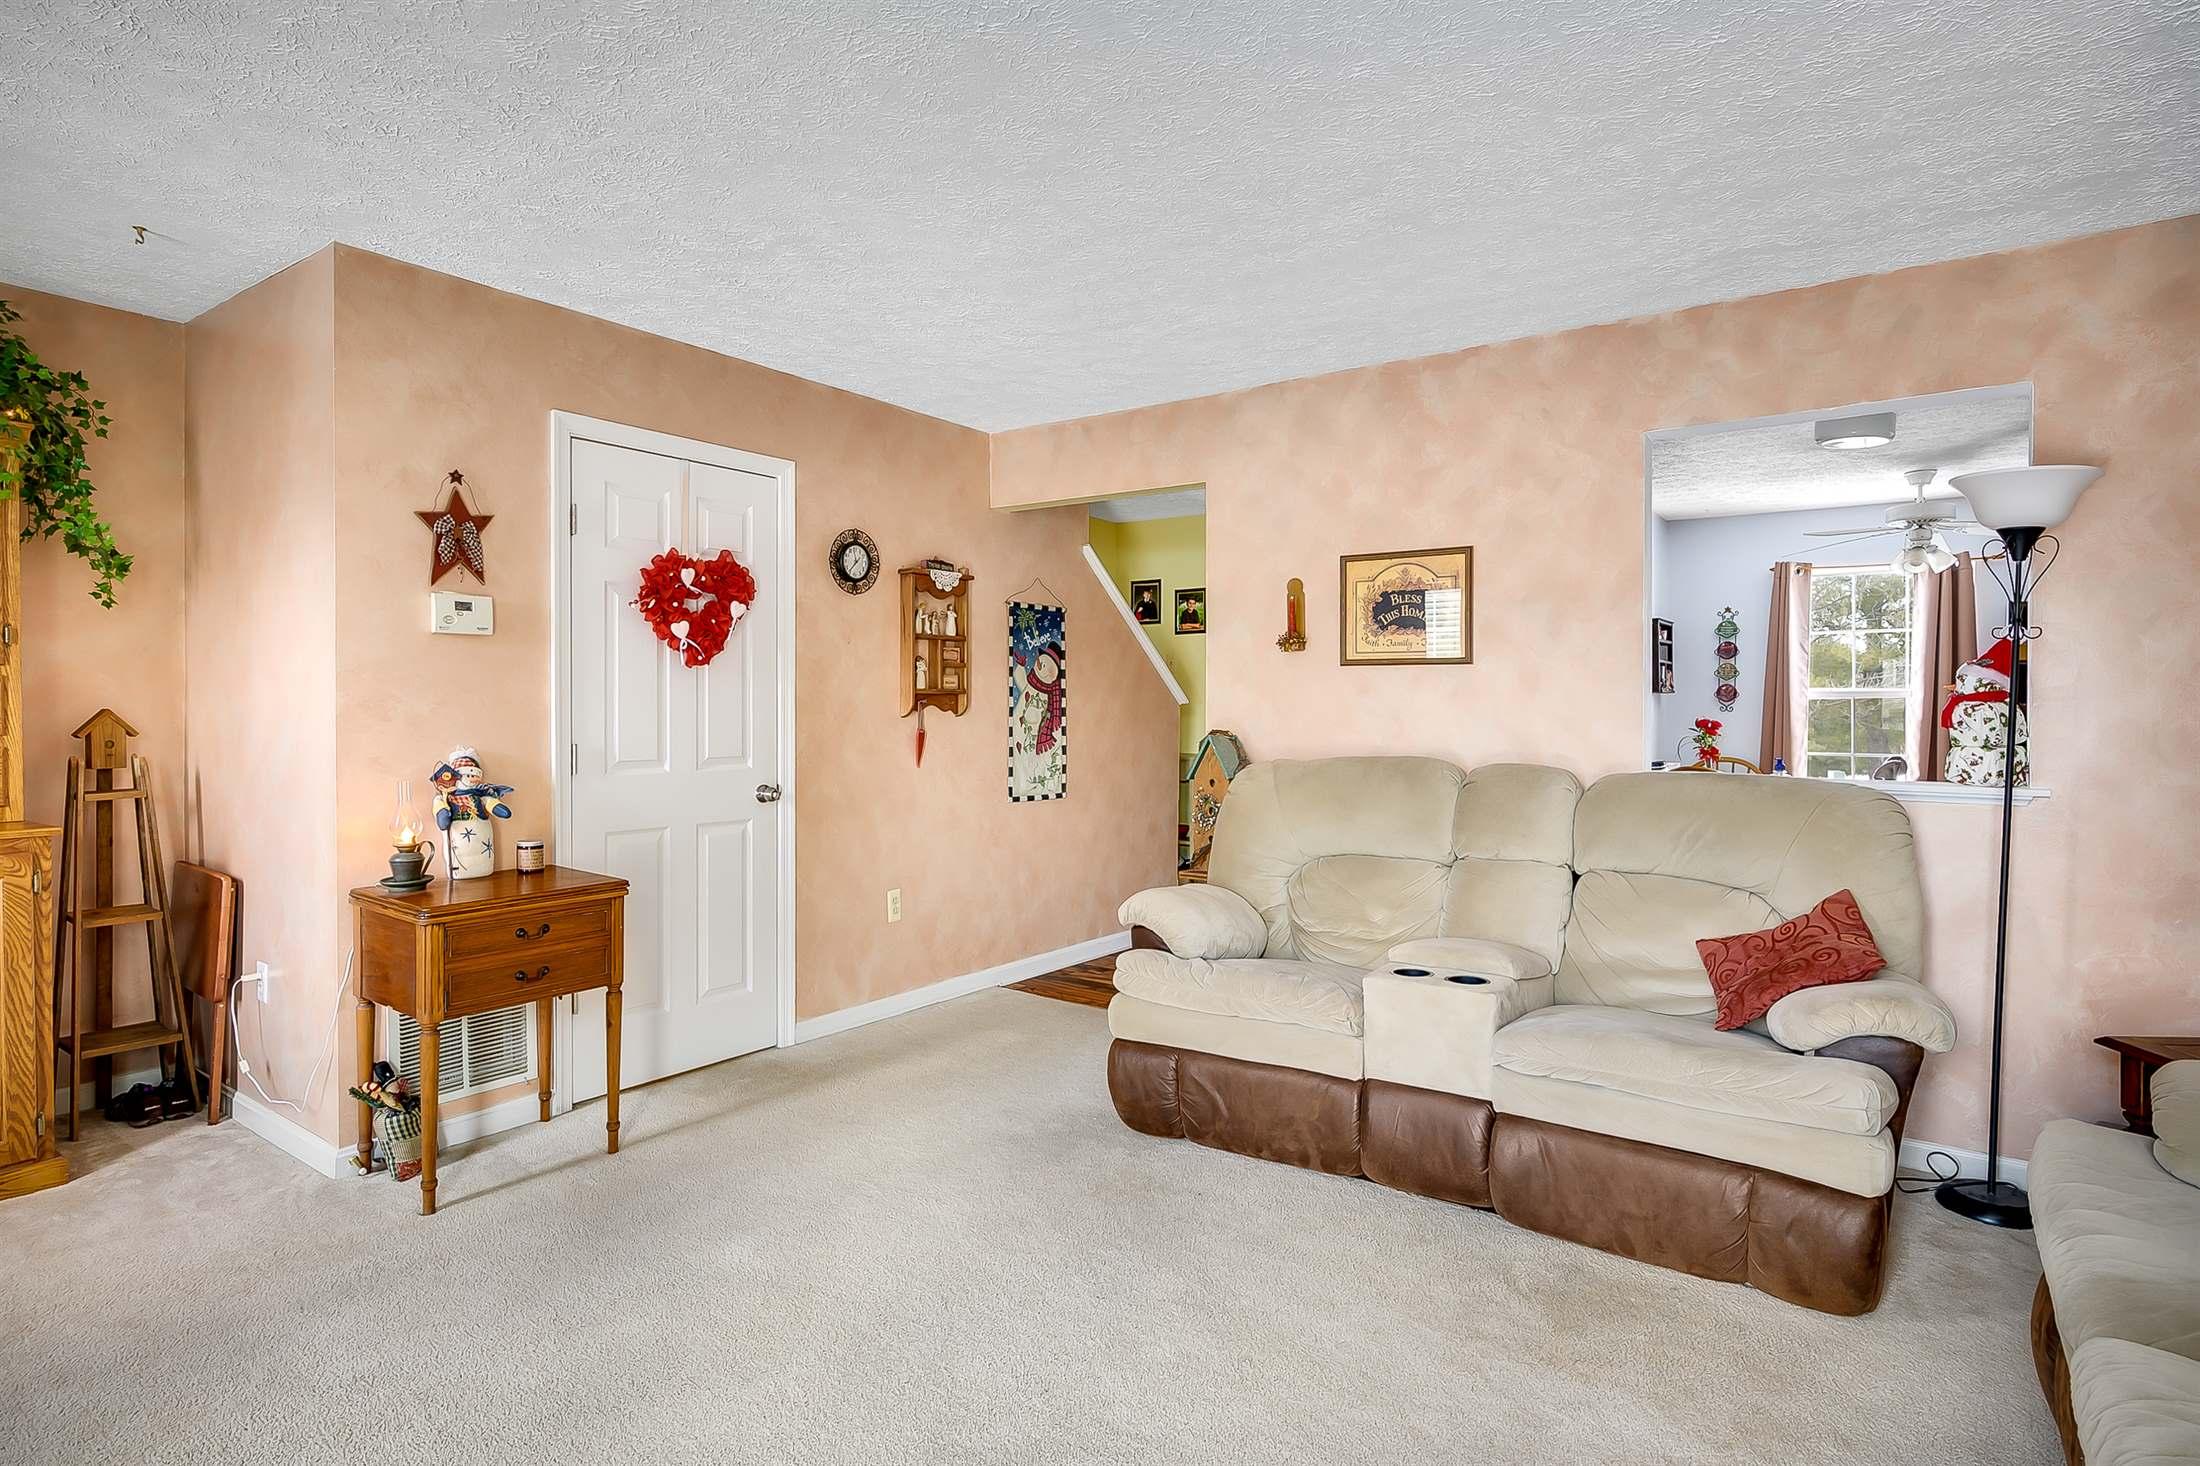 115 Amethyst Court, Stephens City, VA 22655